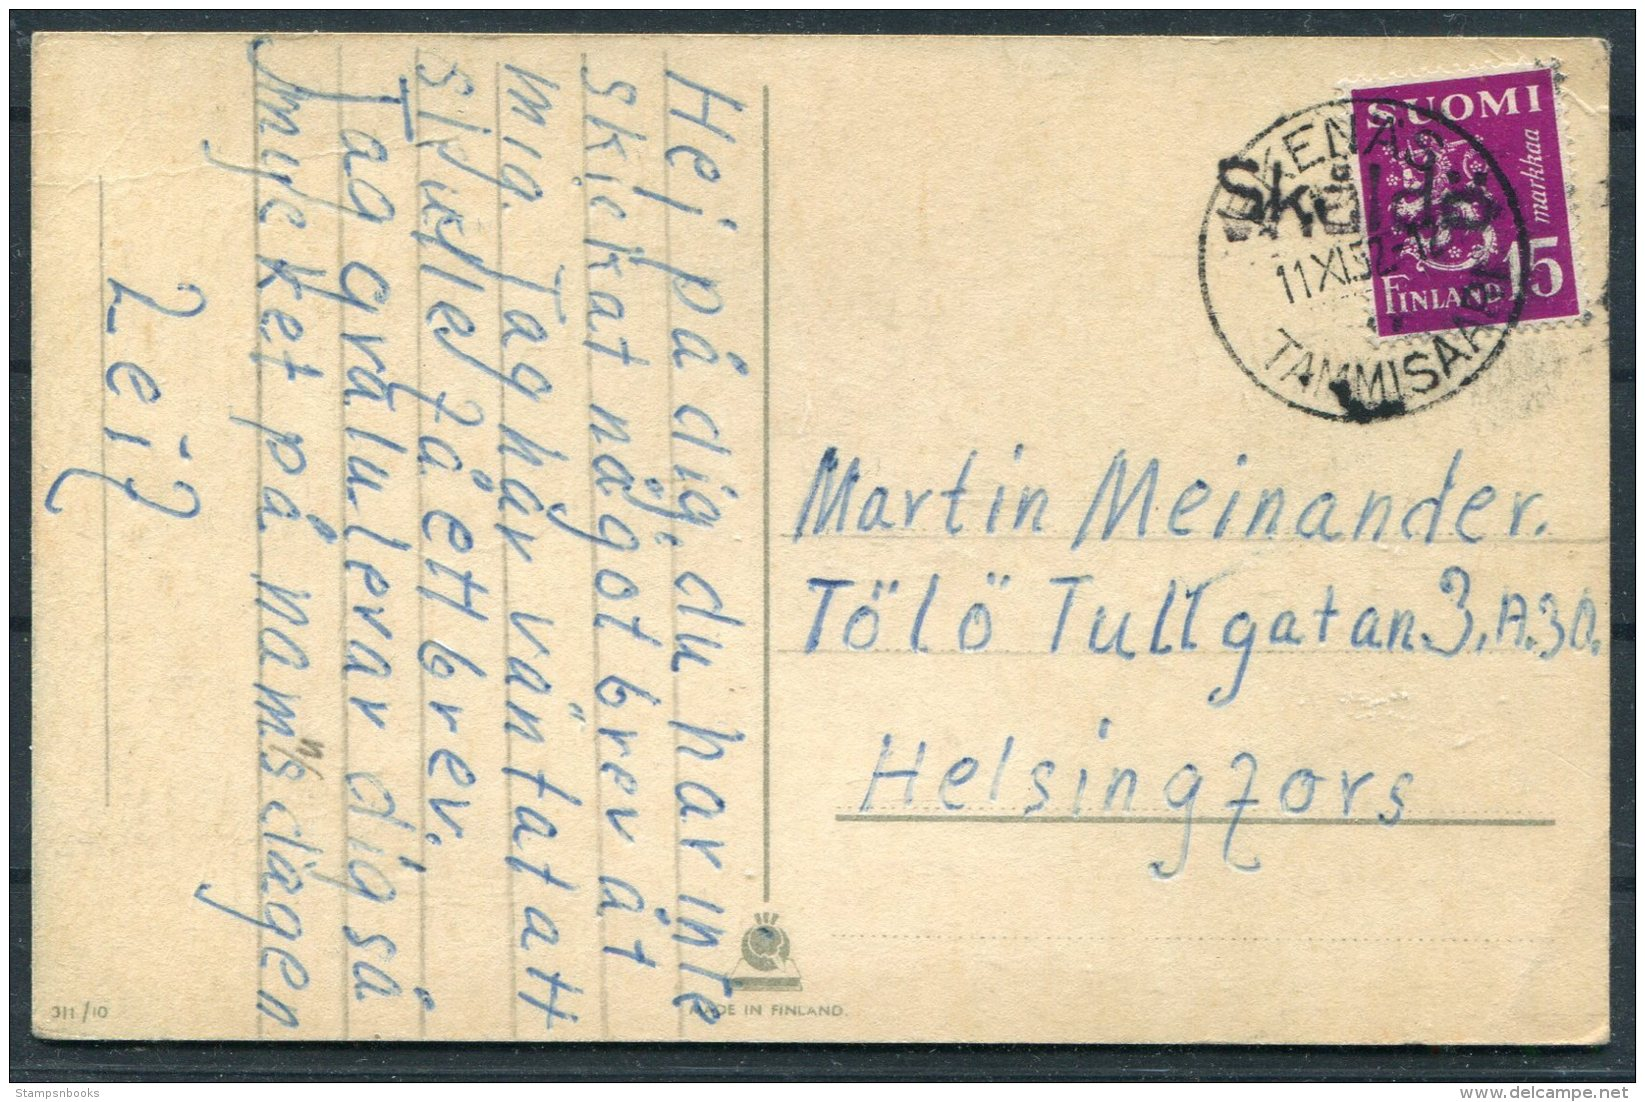 1951 Finland Postcard, Ekenas + SKALDO Straight Line, Rural Cancel - Helsingfors - Covers & Documents